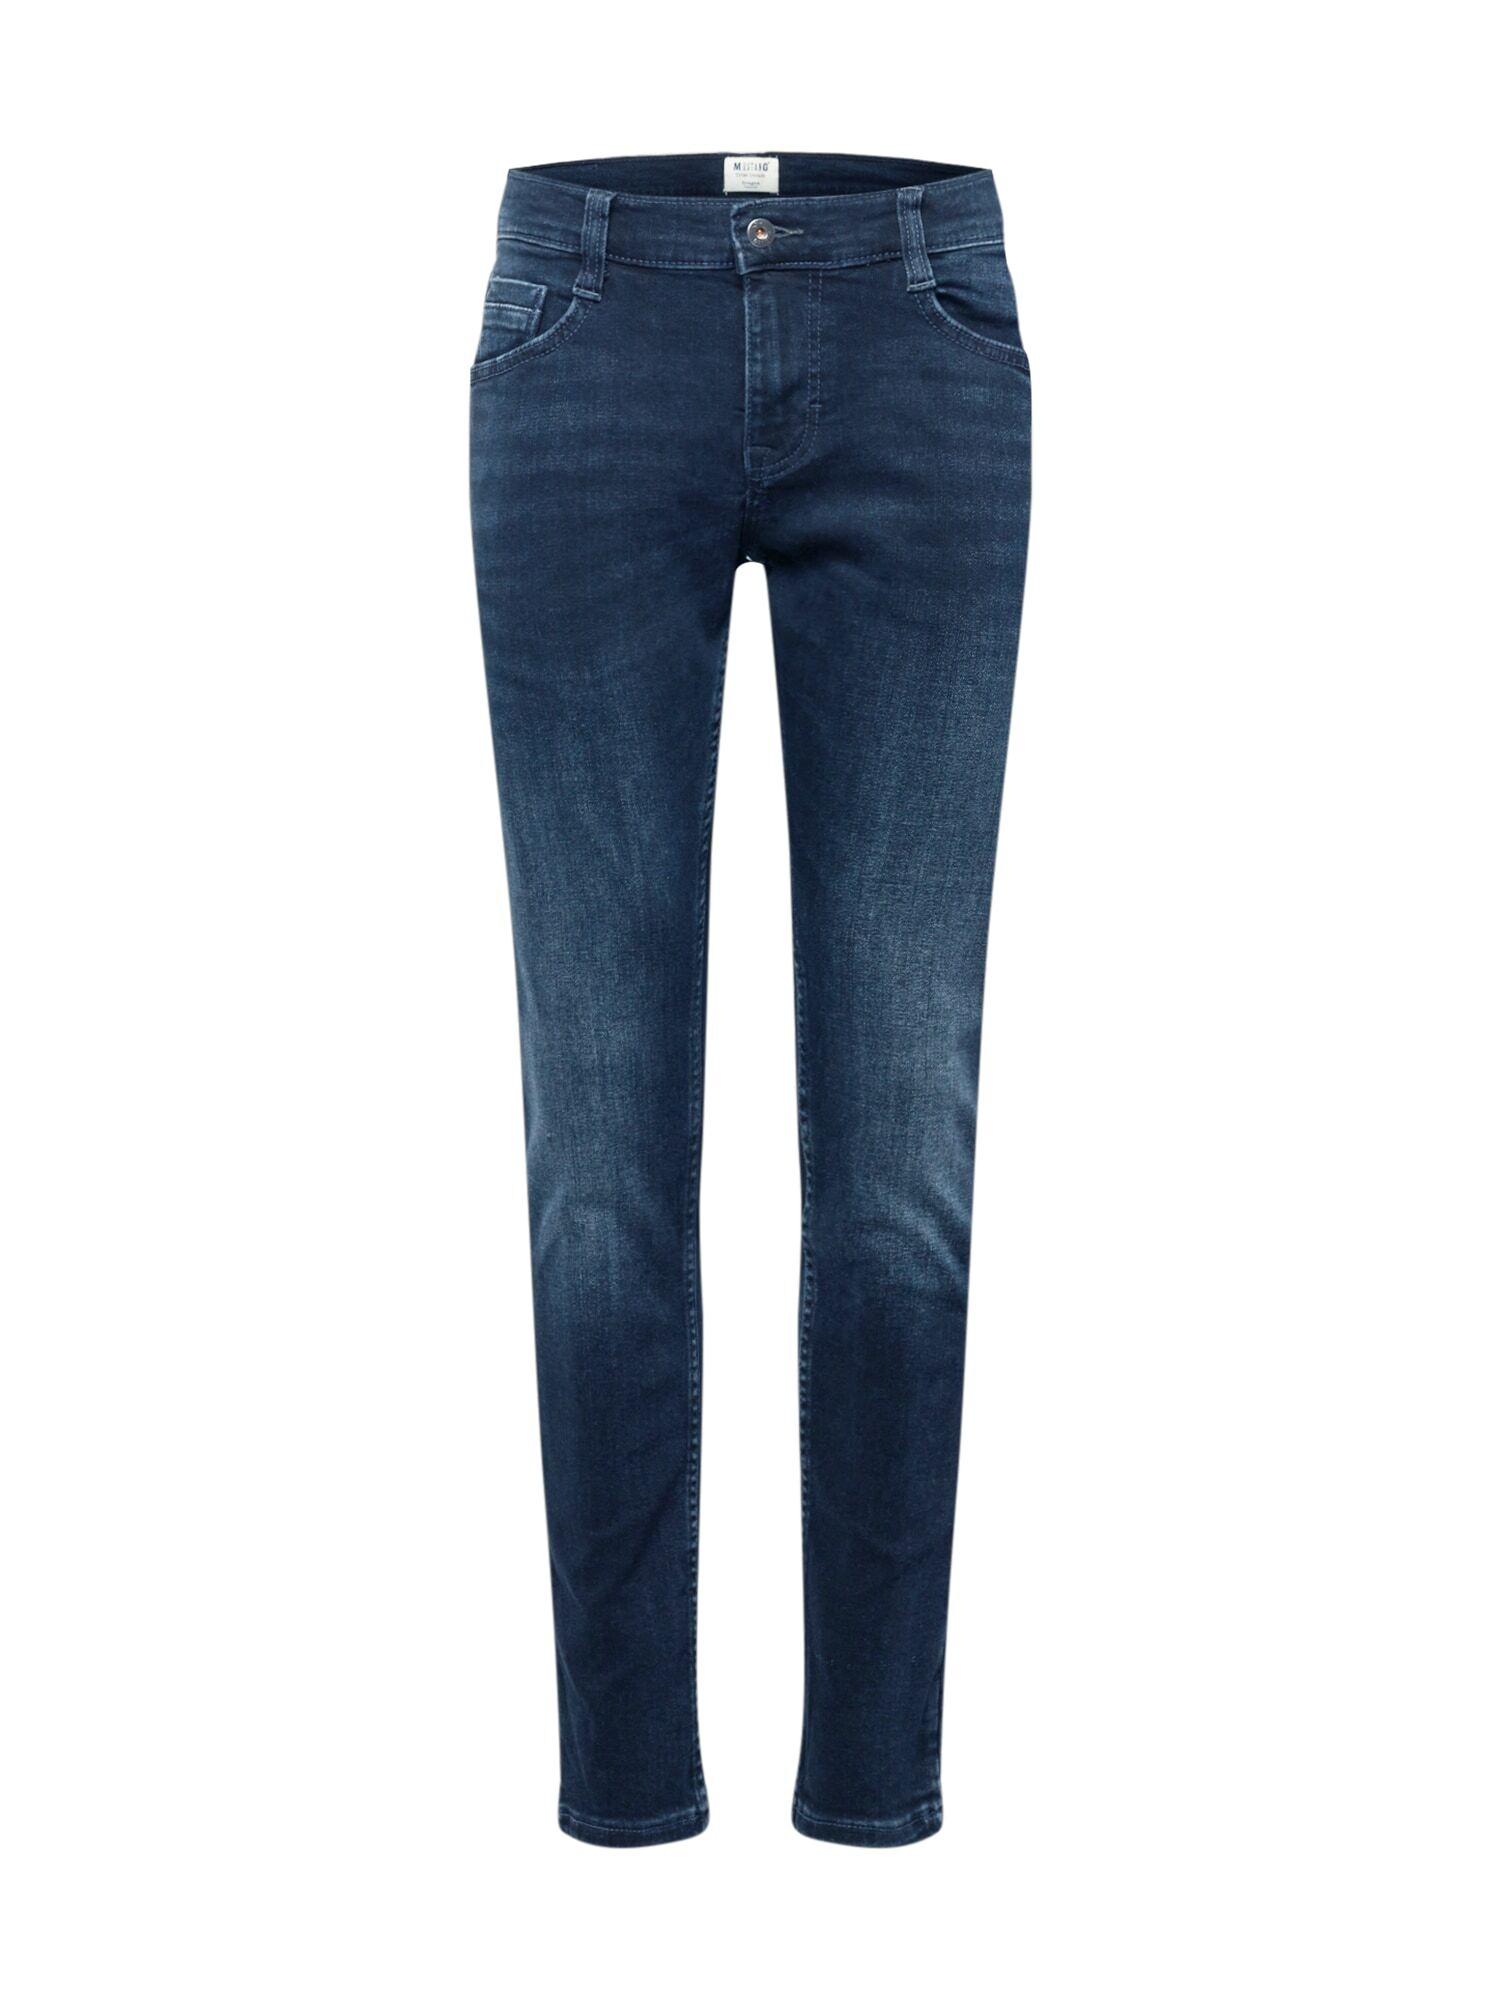 MUSTANG Jean 'Oregon'  - Bleu - Taille: 33 - male